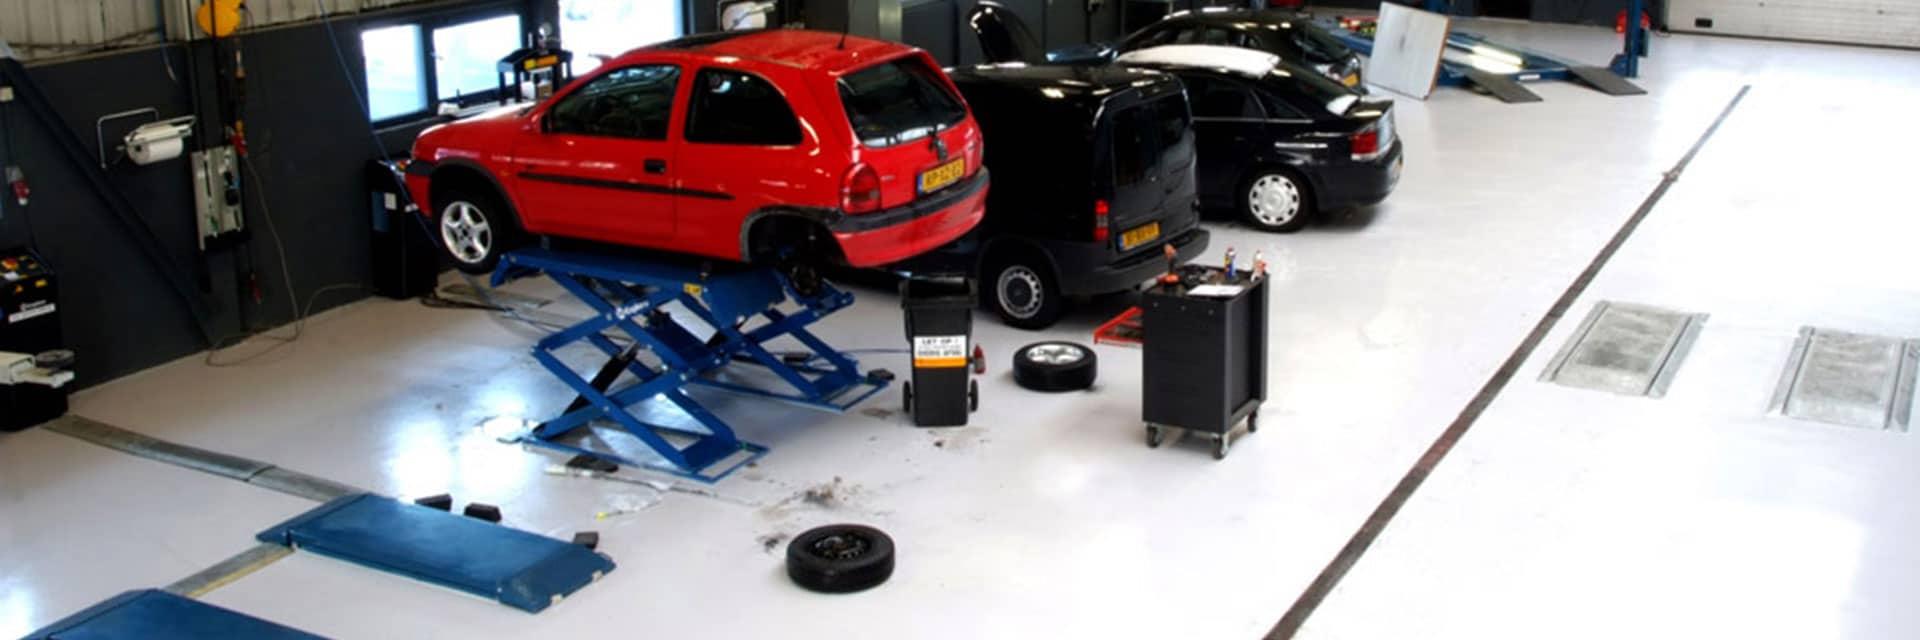 Gietvloer garage